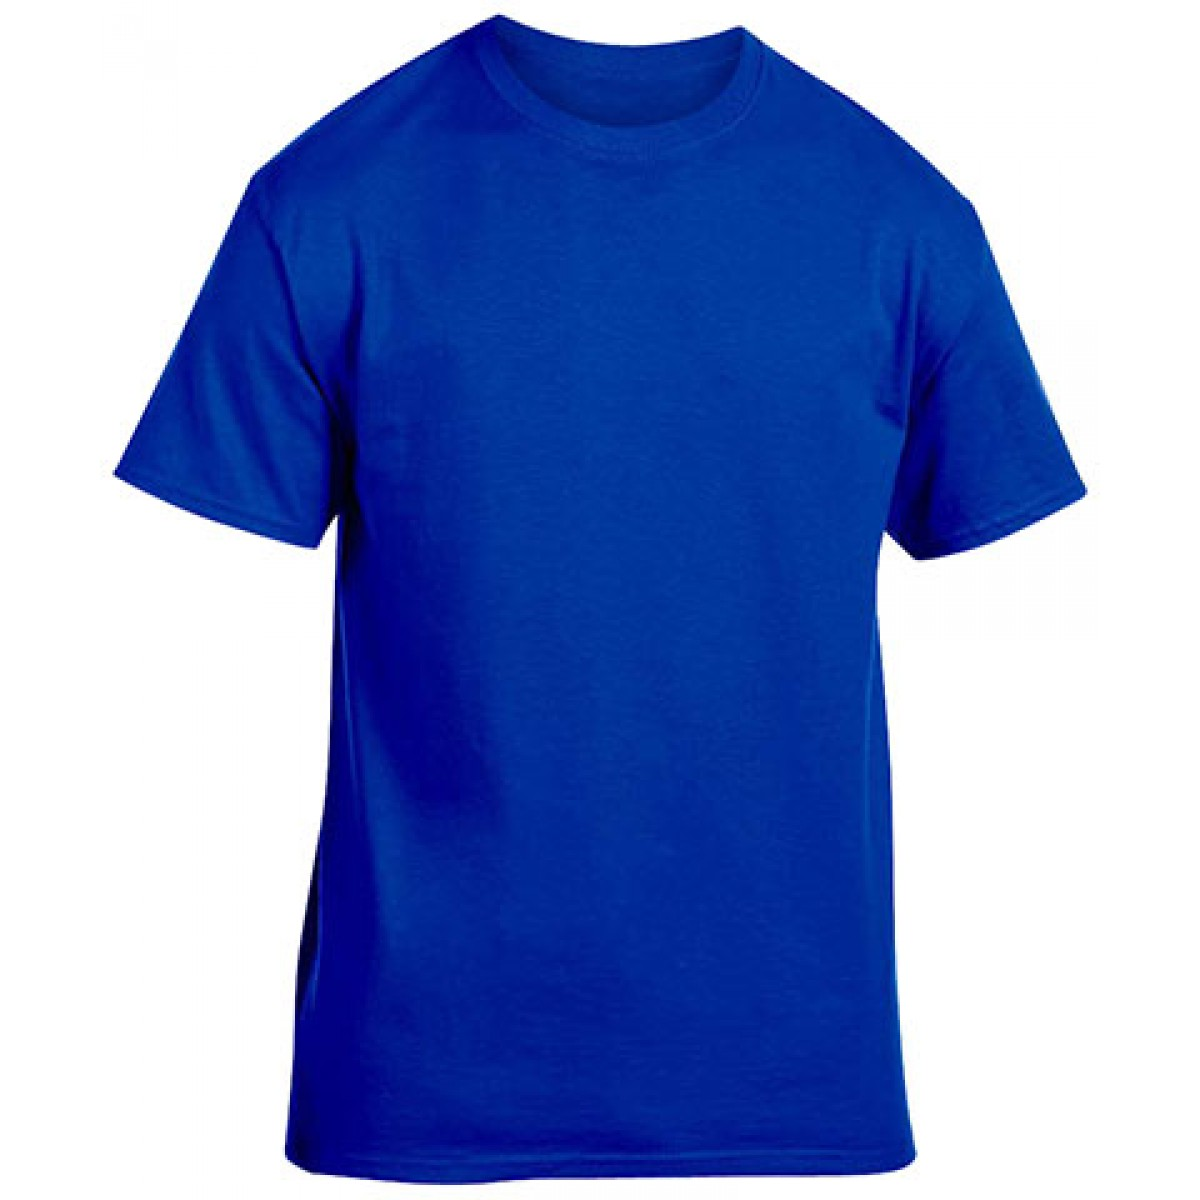 Heavy Cotton Activewear T-Shirt-Royal Blue-3XL